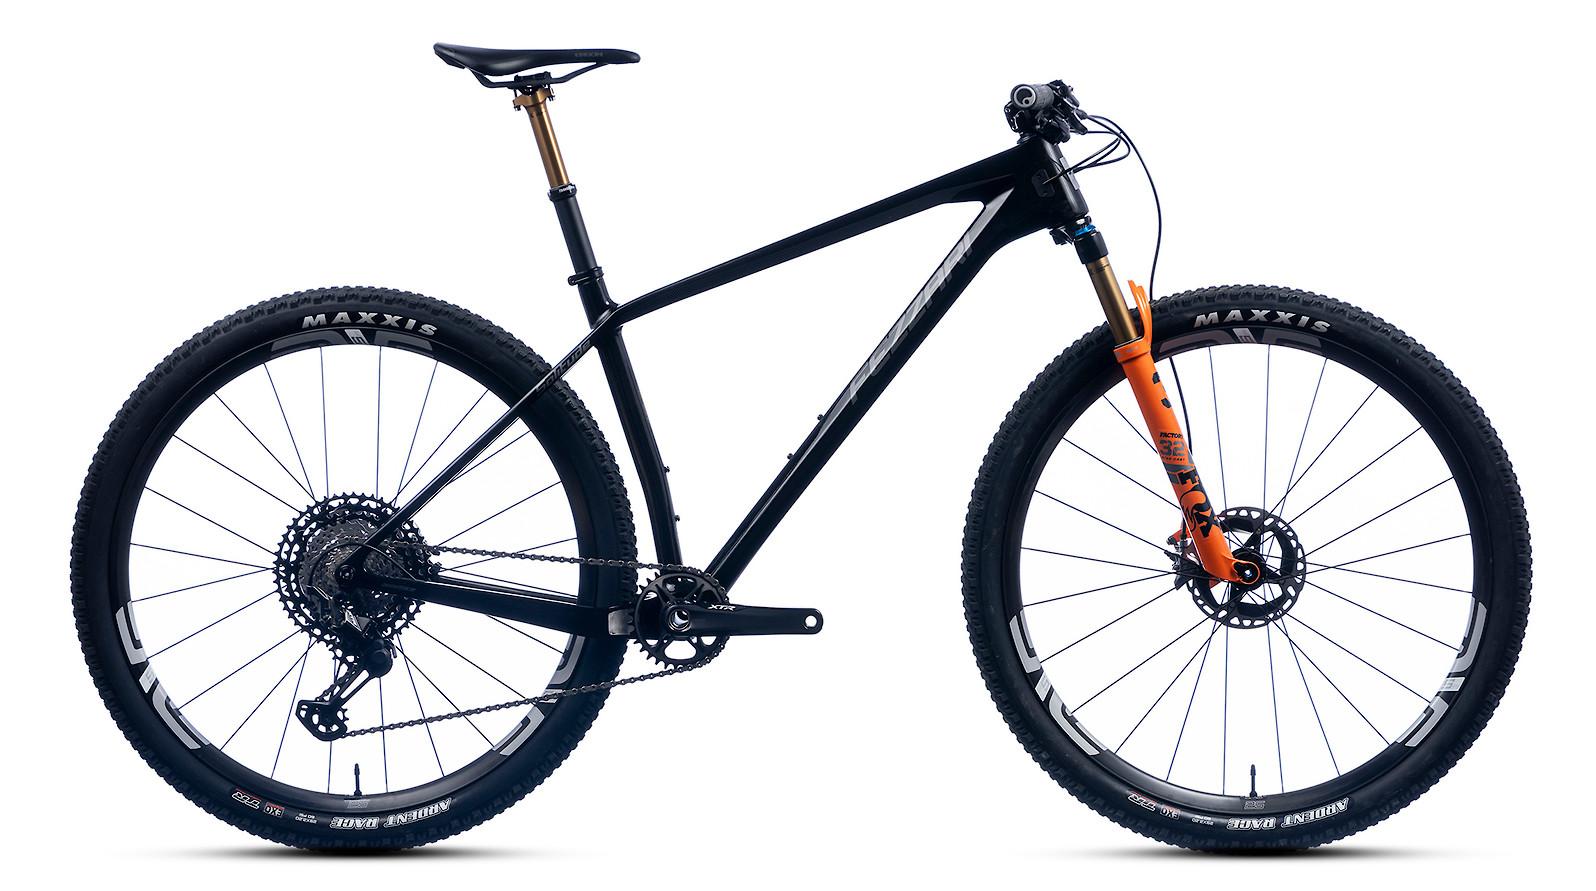 2021 Fezzari Solitude Team XTR